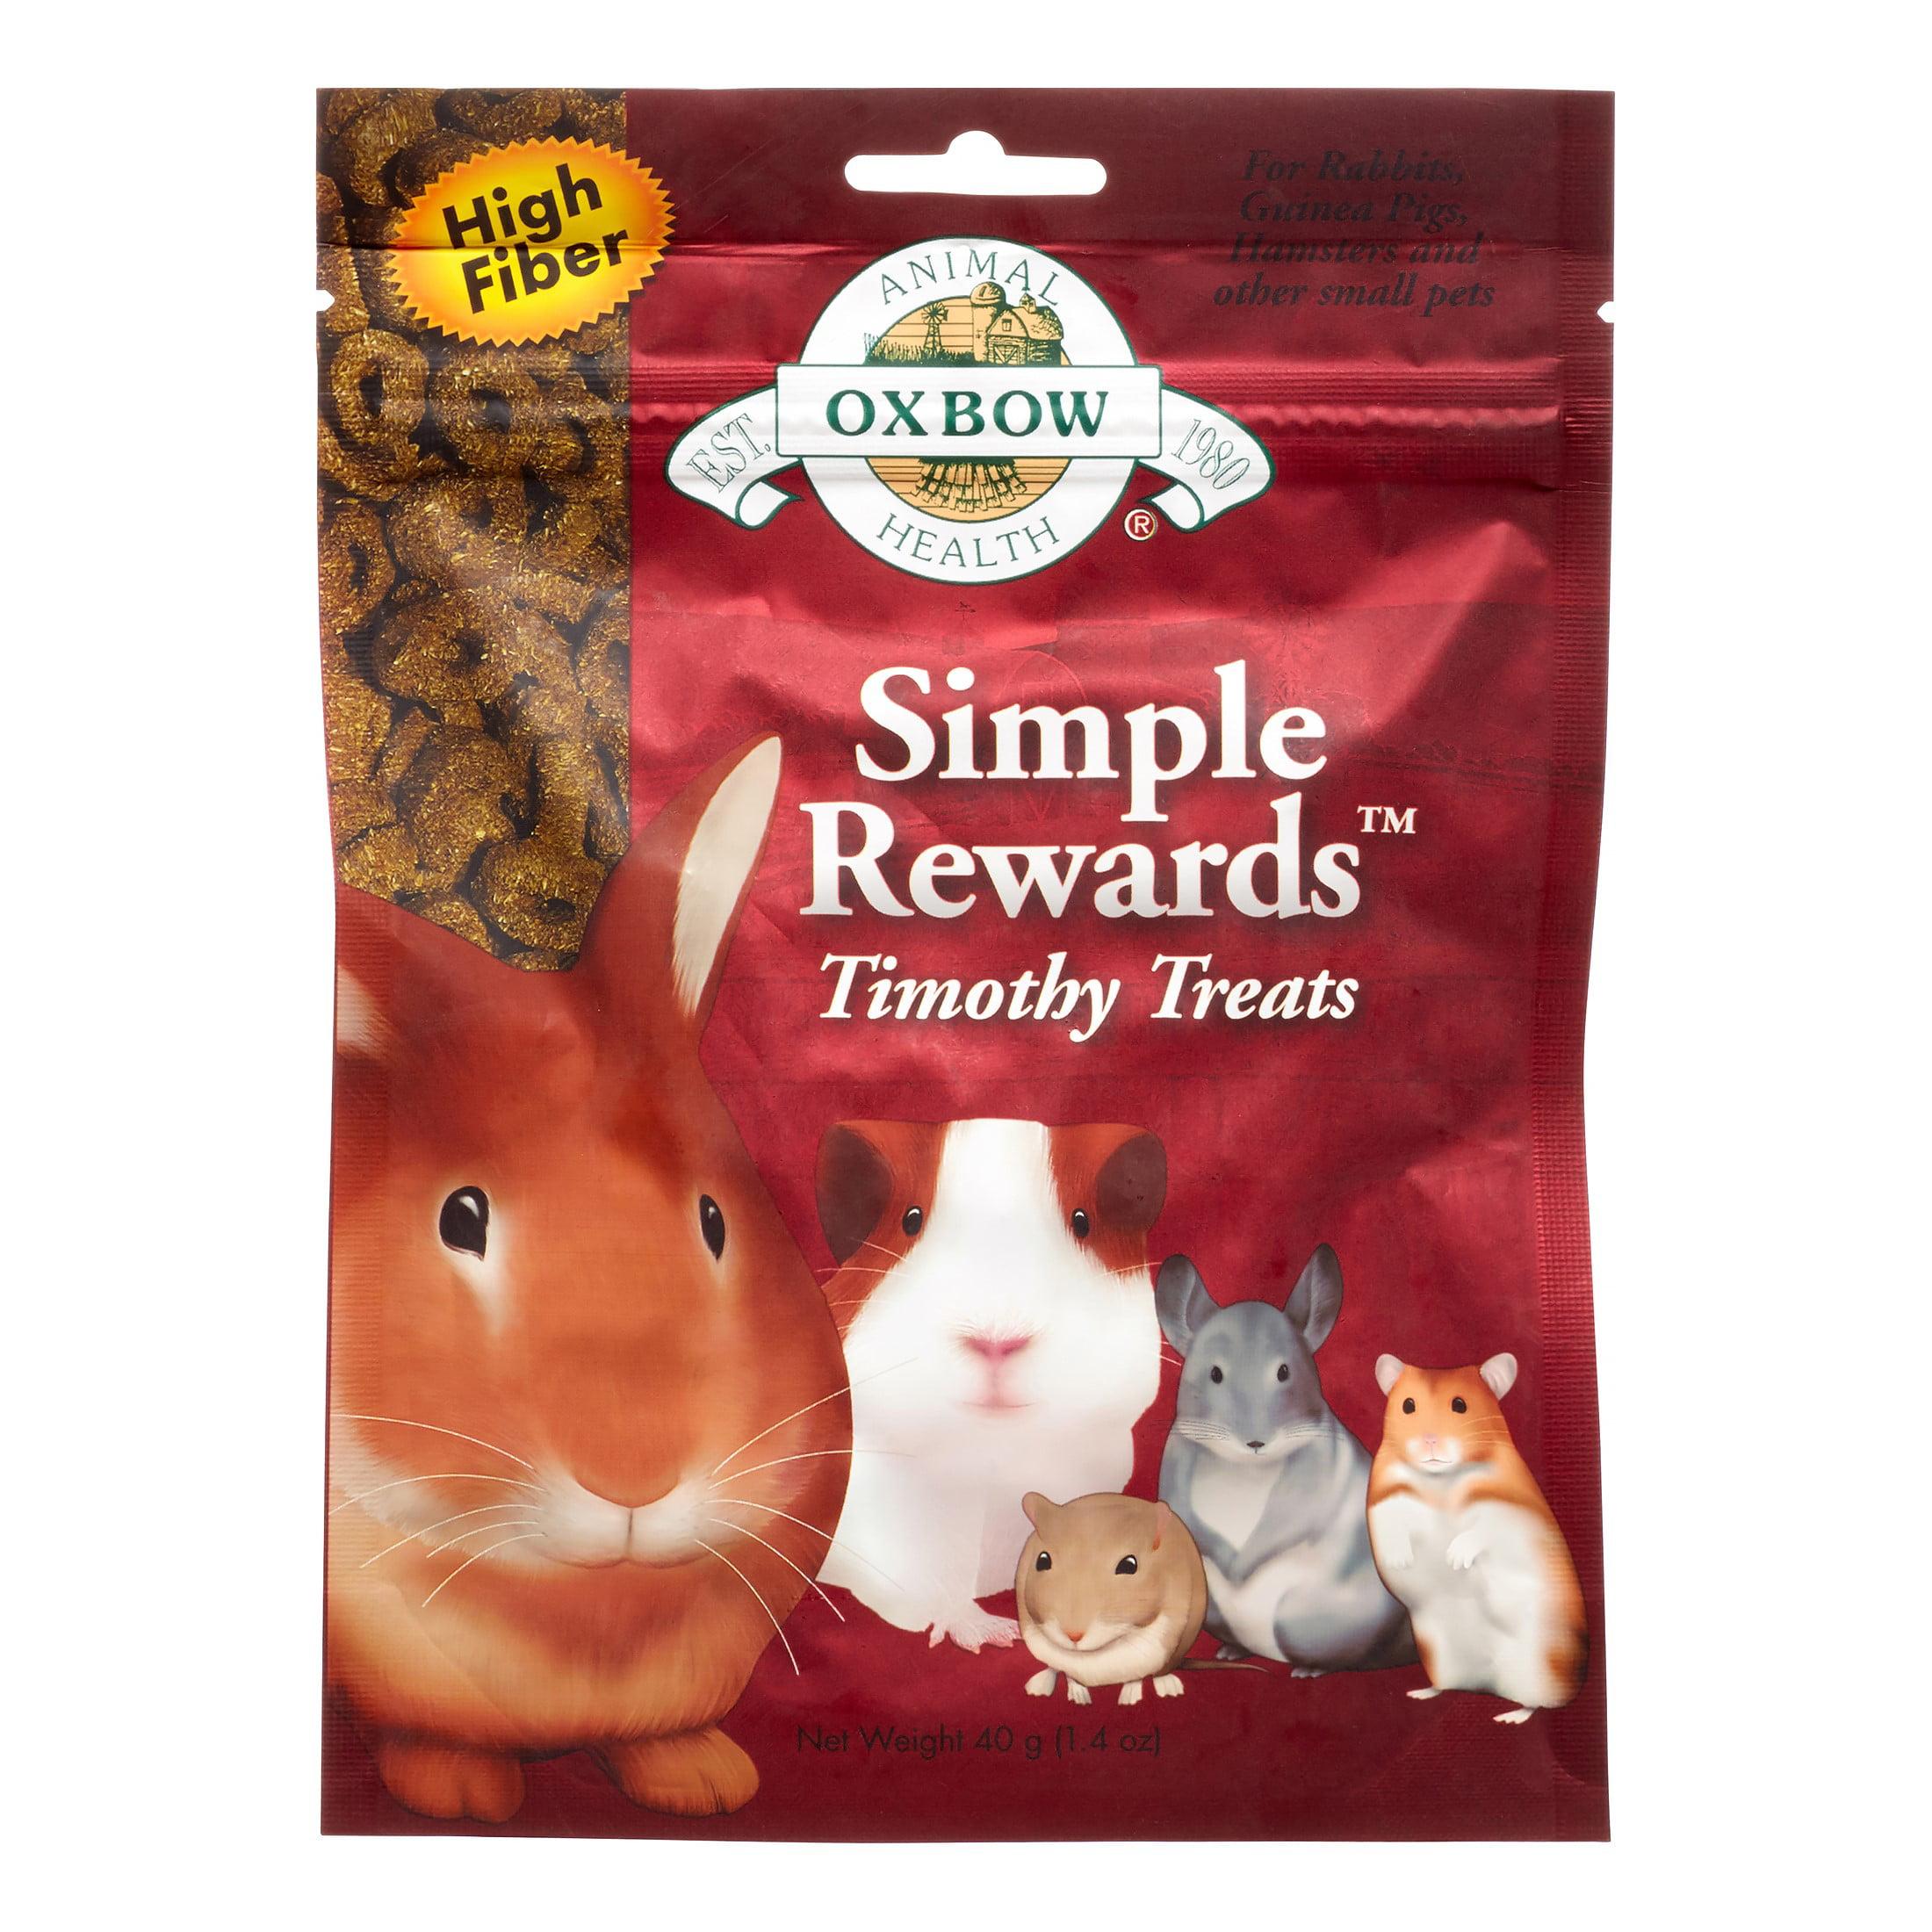 Oxbow Simple Rewards Small Animal Treats, Timothy Treats, 1.4 oz.